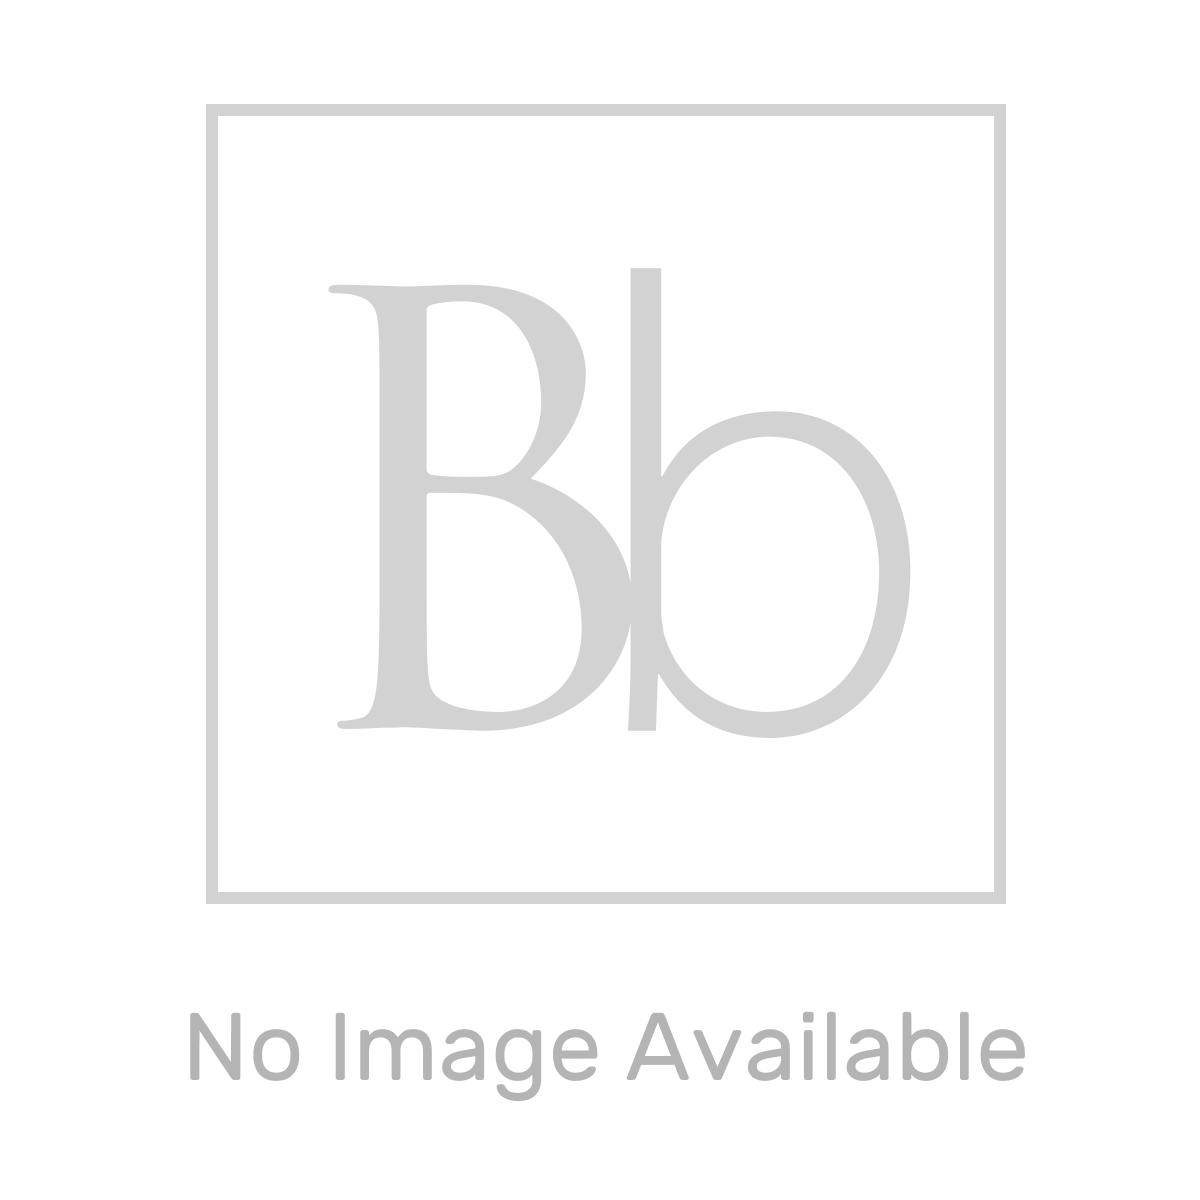 RAK Washington White Freestanding Bath 1560mm